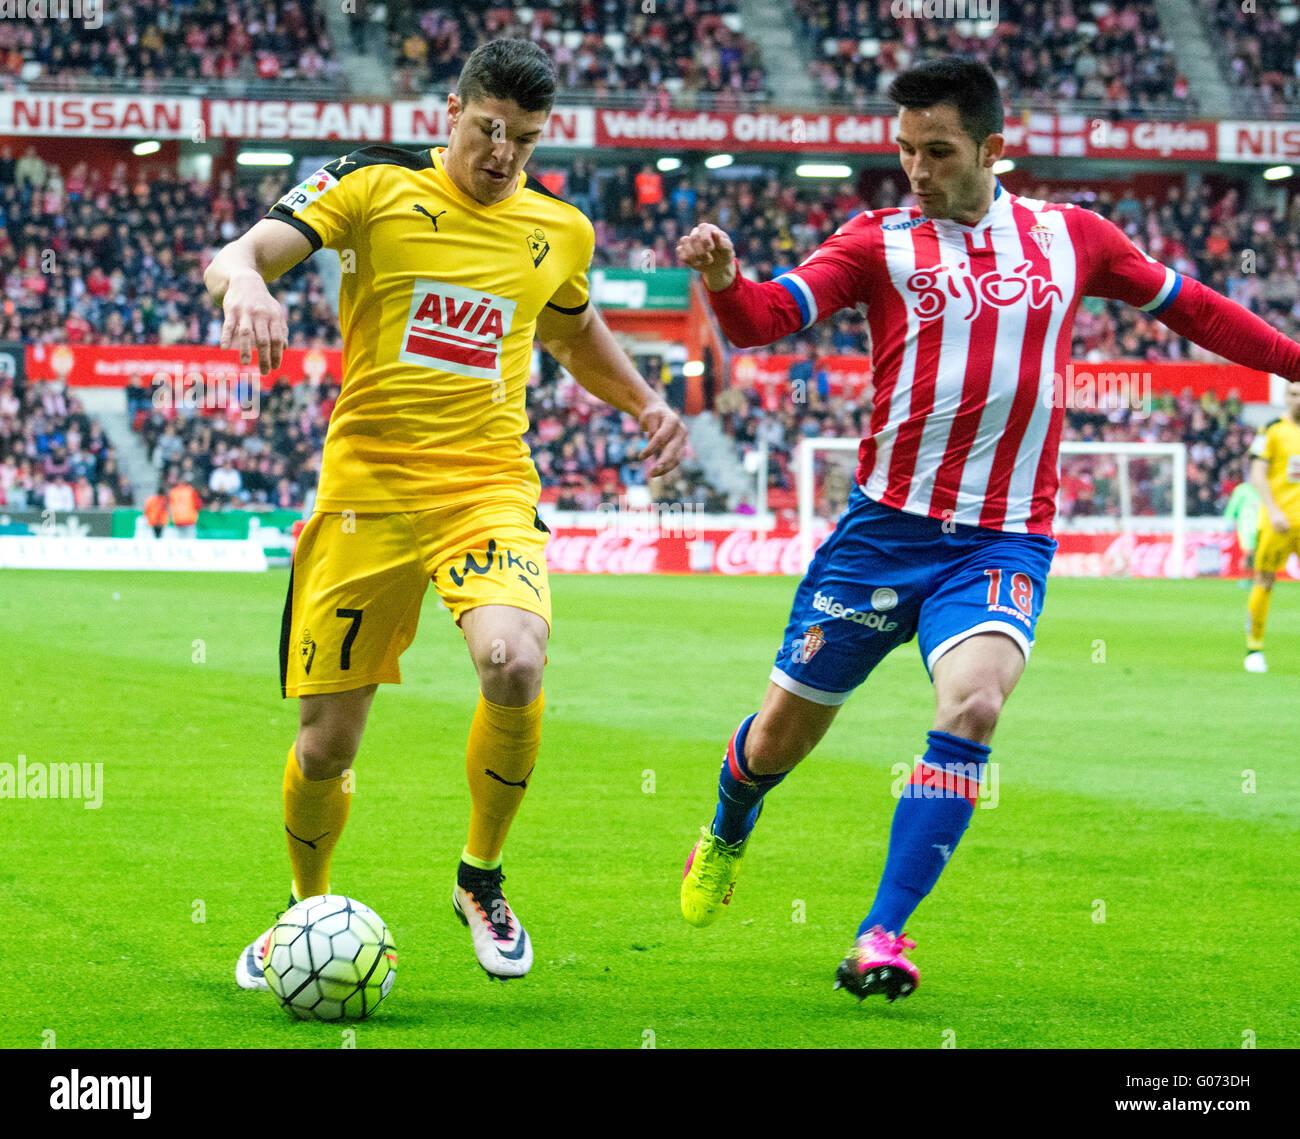 Gijón, España. 29 de abril, 2016. Ander Capa (defensor, SD Eibar) en acción cubierto por Isma López (centrocampista Foto de stock